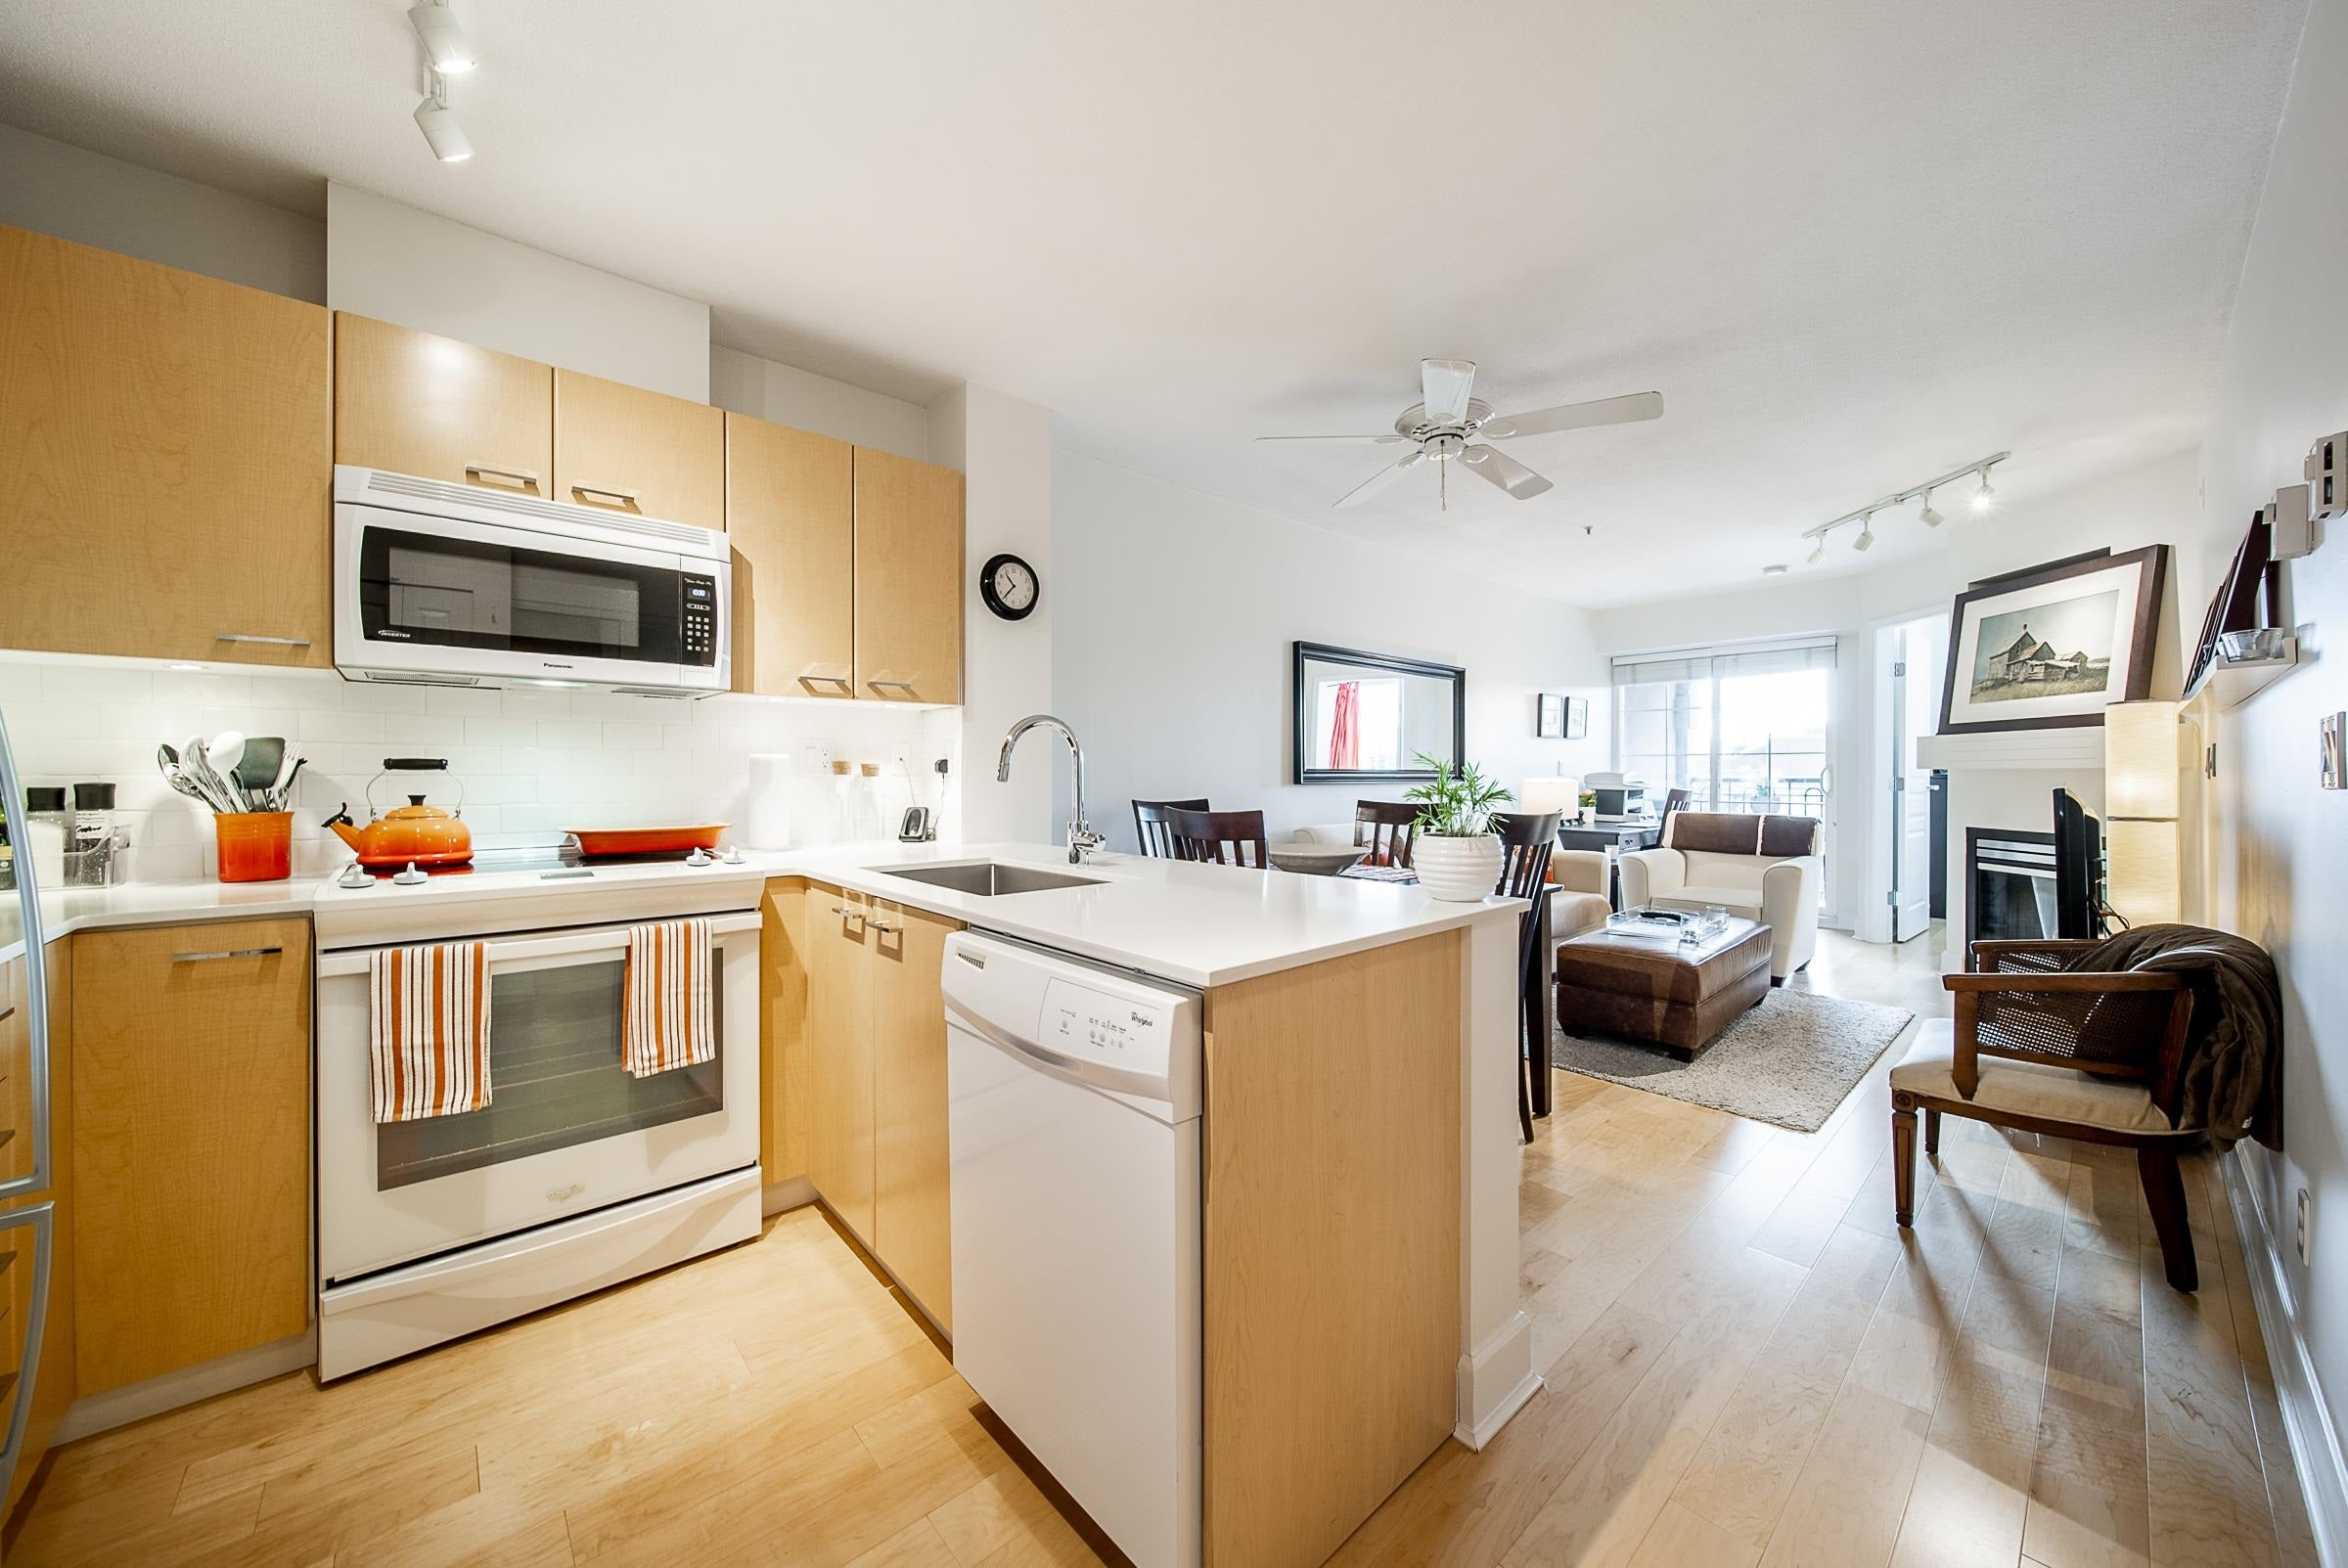 406 1989 DUNBAR STREET - Kitsilano Apartment/Condo for sale, 1 Bedroom (R2624949) - #2